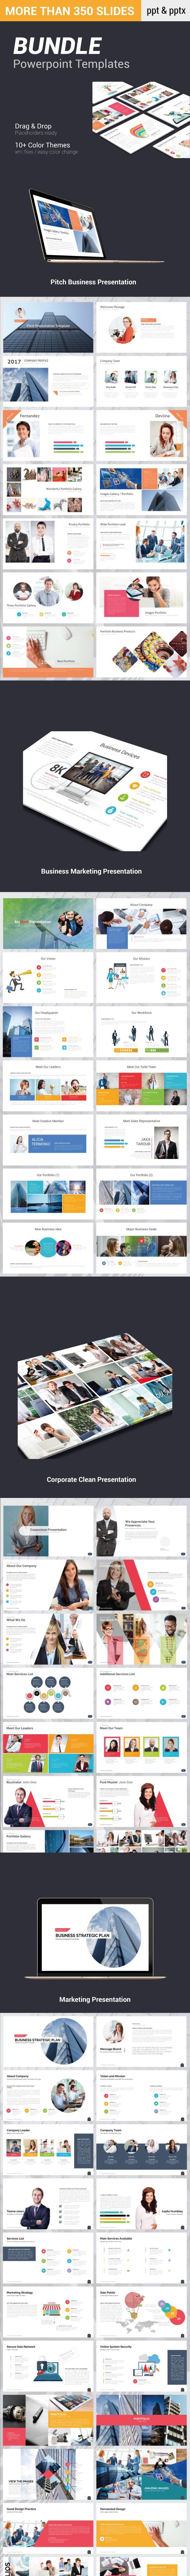 Bundle Powerpoint Presentation Templates - Pitch Deck PowerPoint Templates